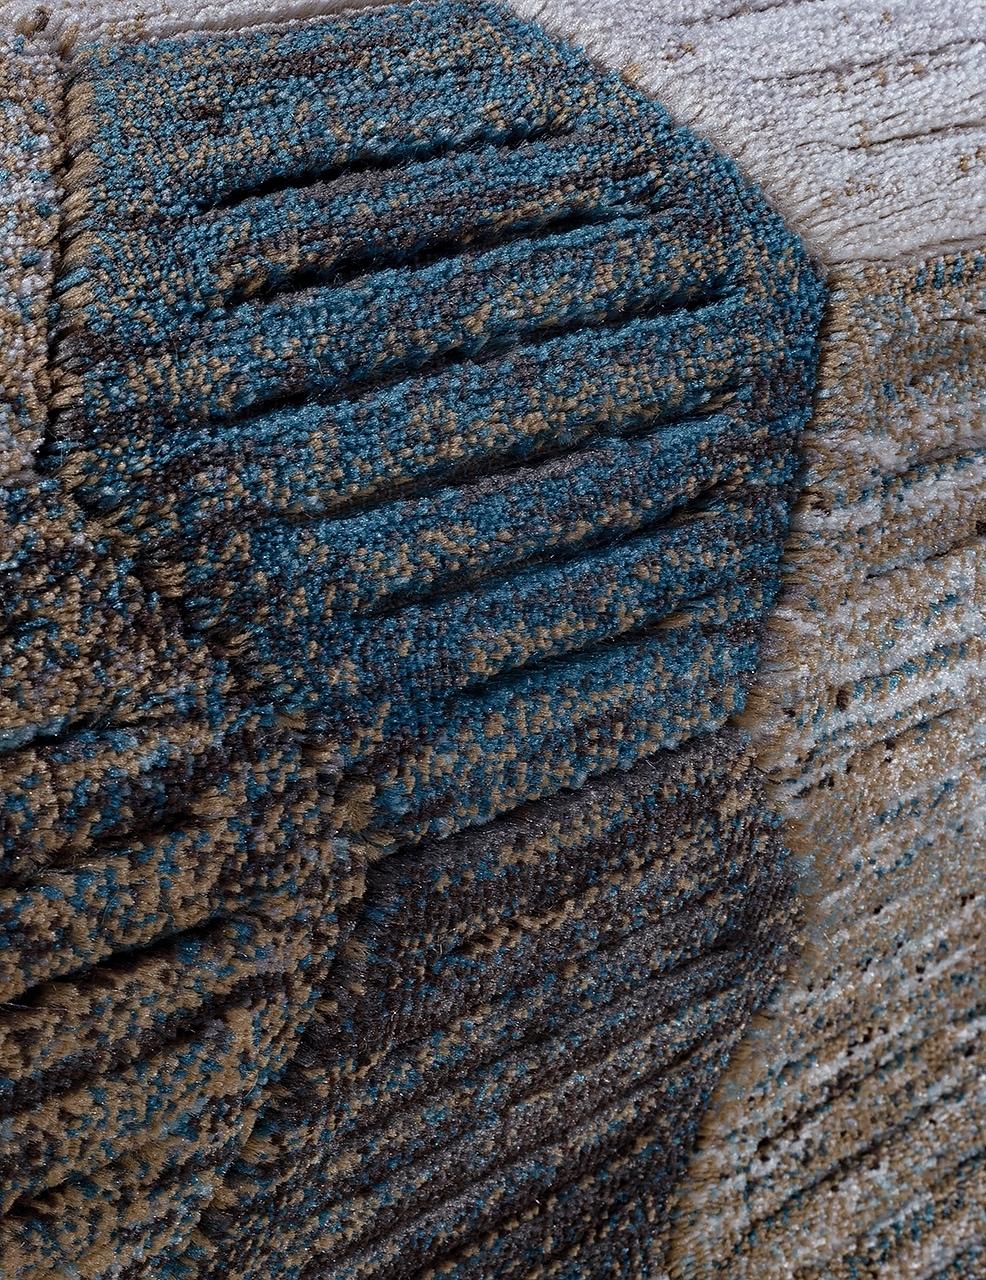 Ковер D579 - BEIGE-BLUE - Овал - коллекция MATRIX - фото 4